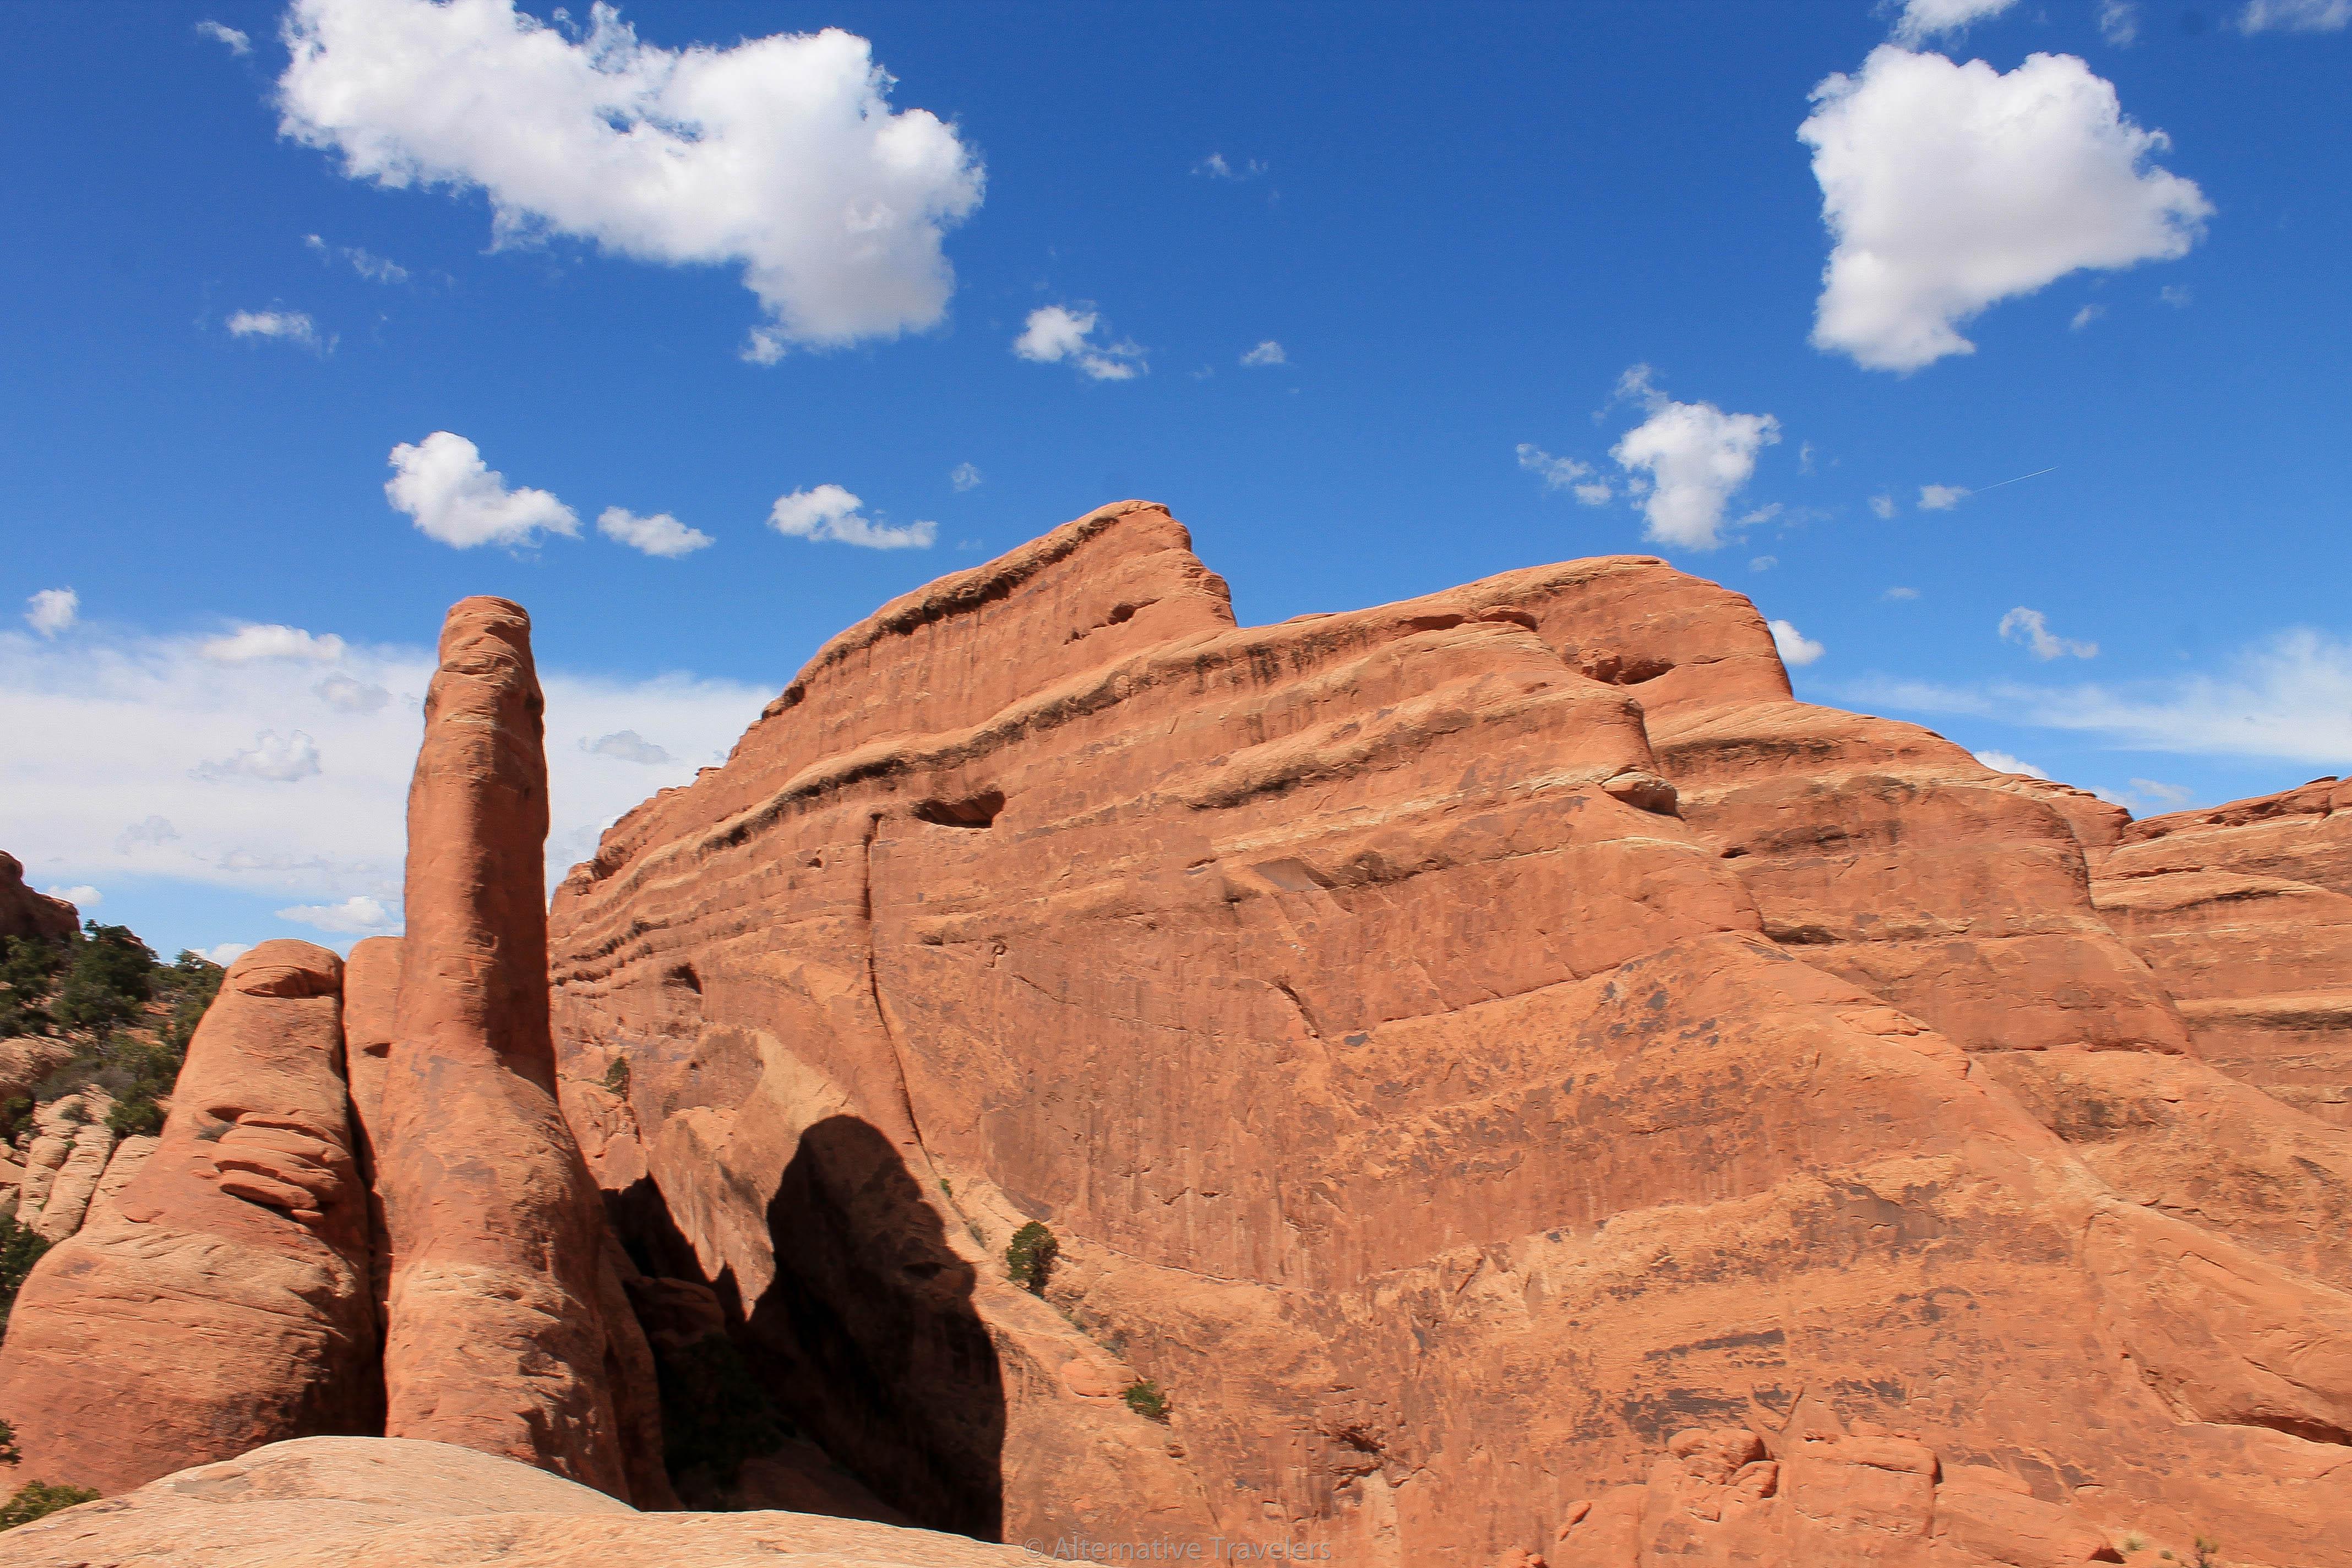 One of the Arches National Park Trails - Devil's Garden Primitive Trail